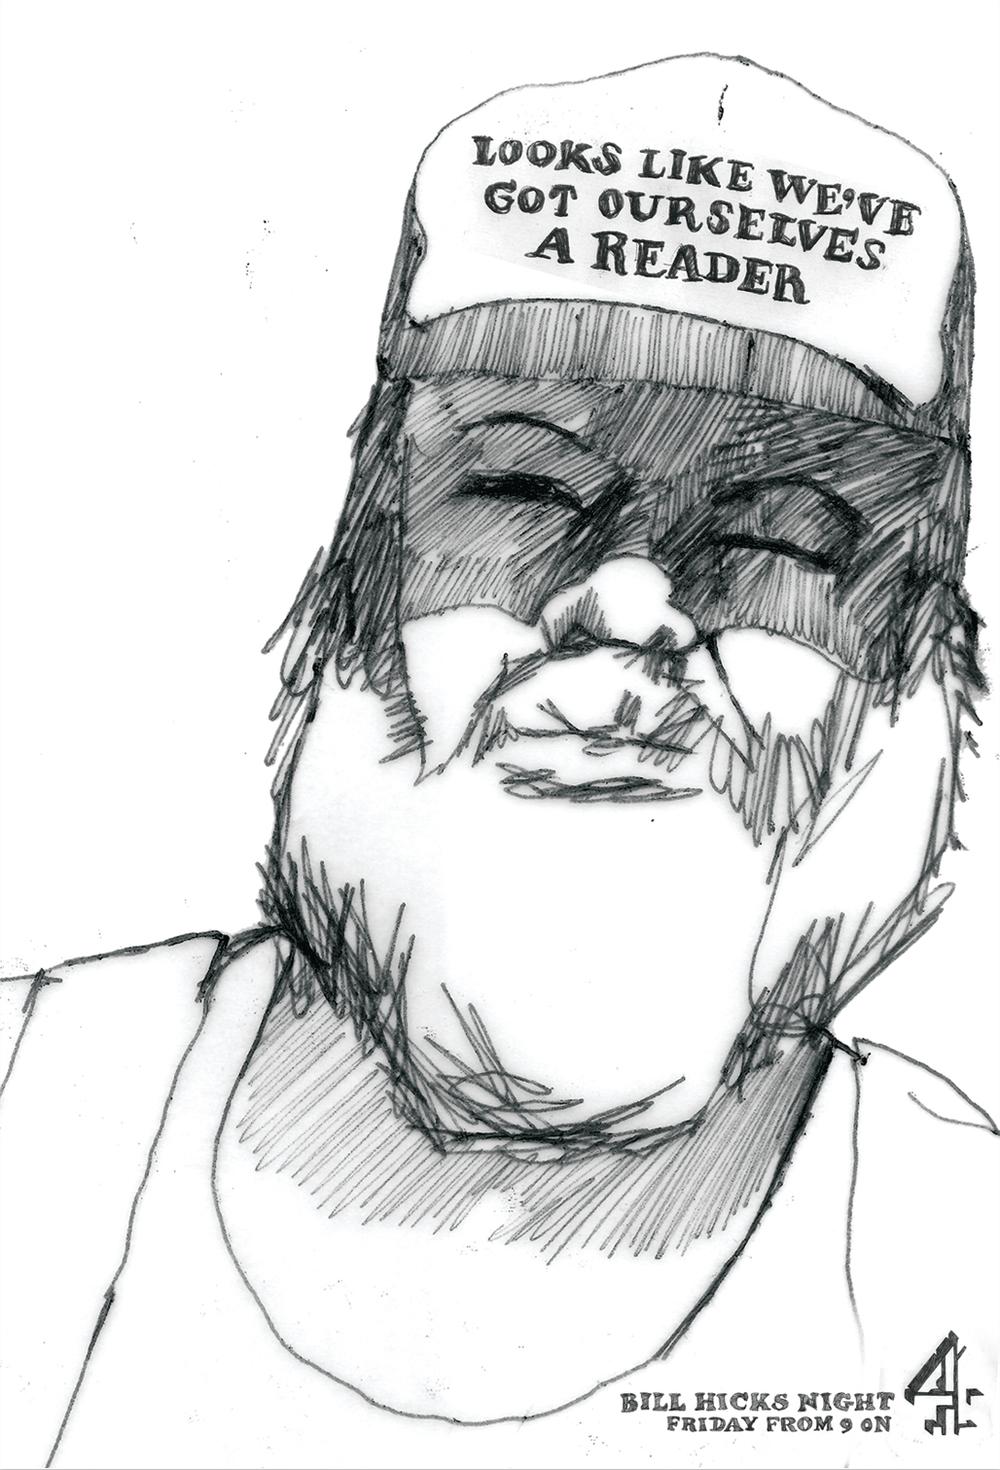 readerwhiteA.png